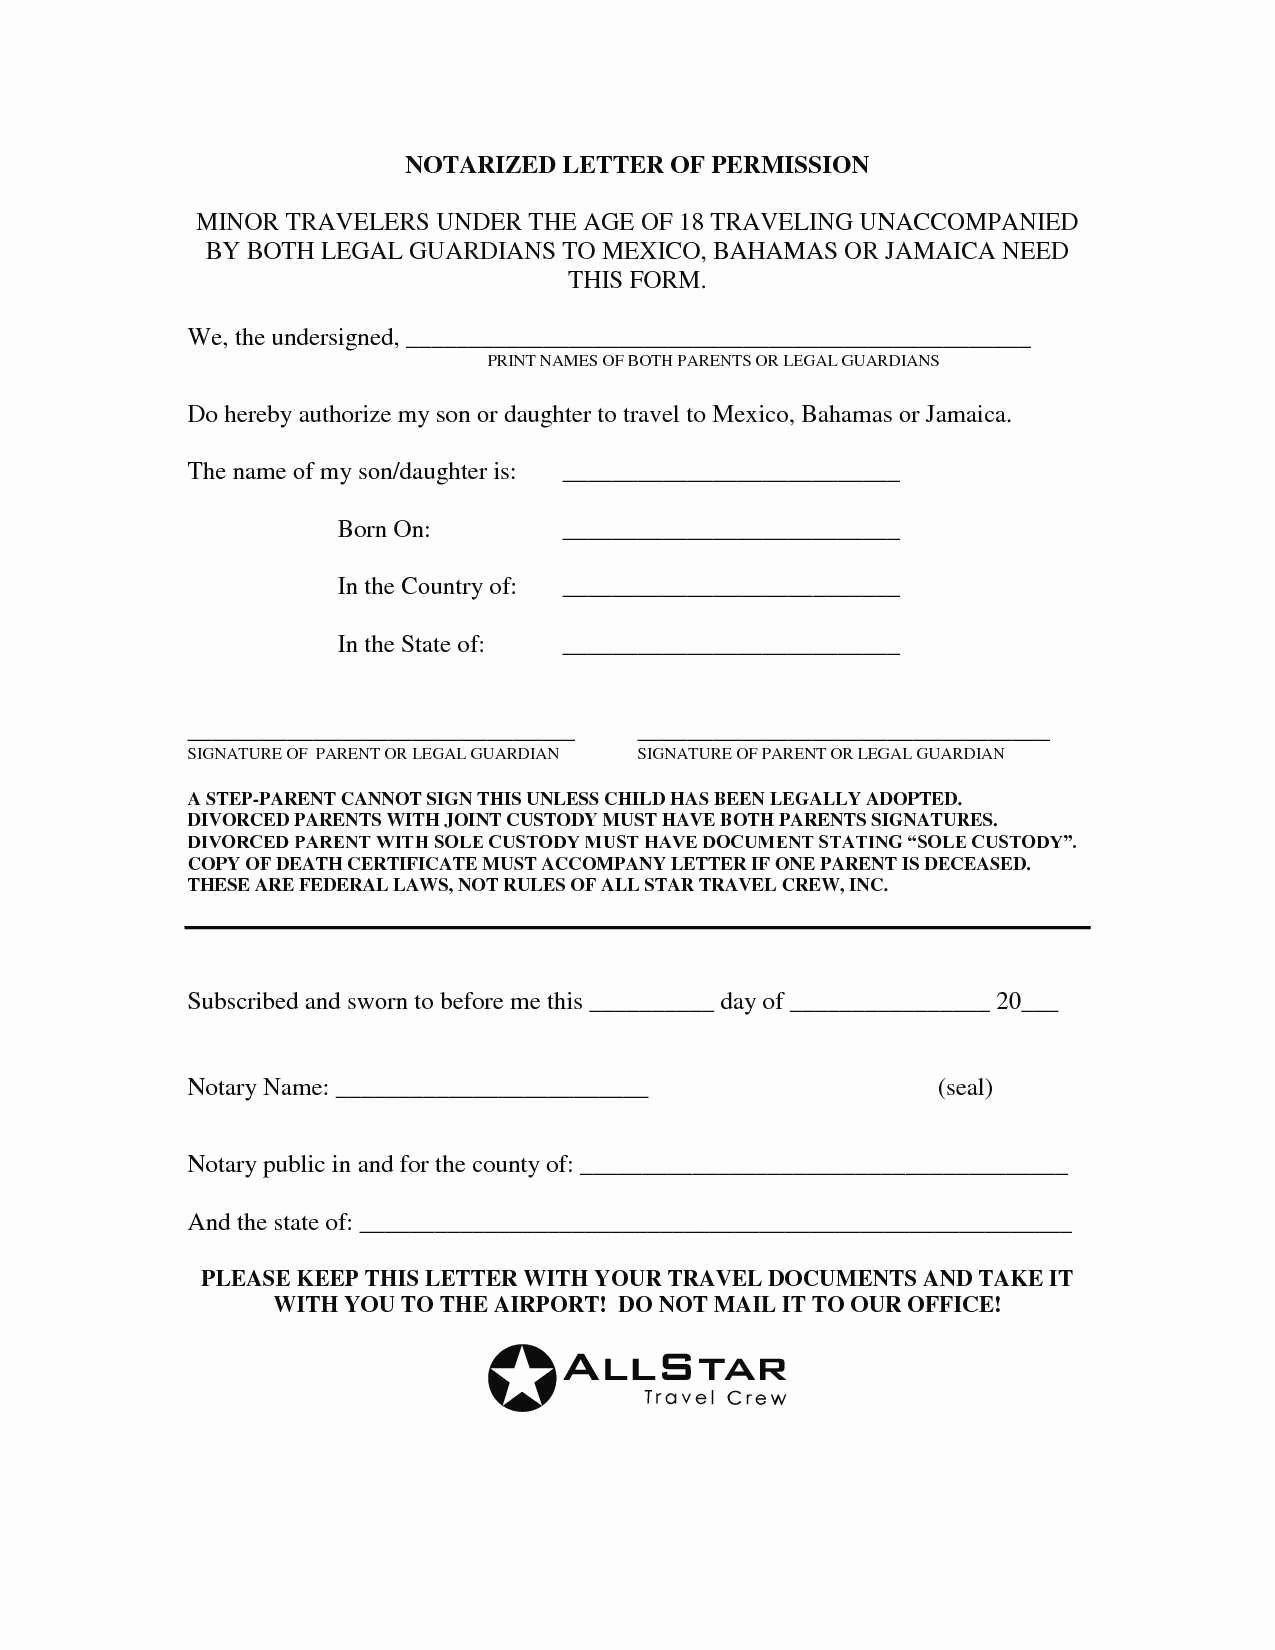 Notarized Custody Agreement Template Luxury Notarized Custody Agreement Template New 13 Inspirational